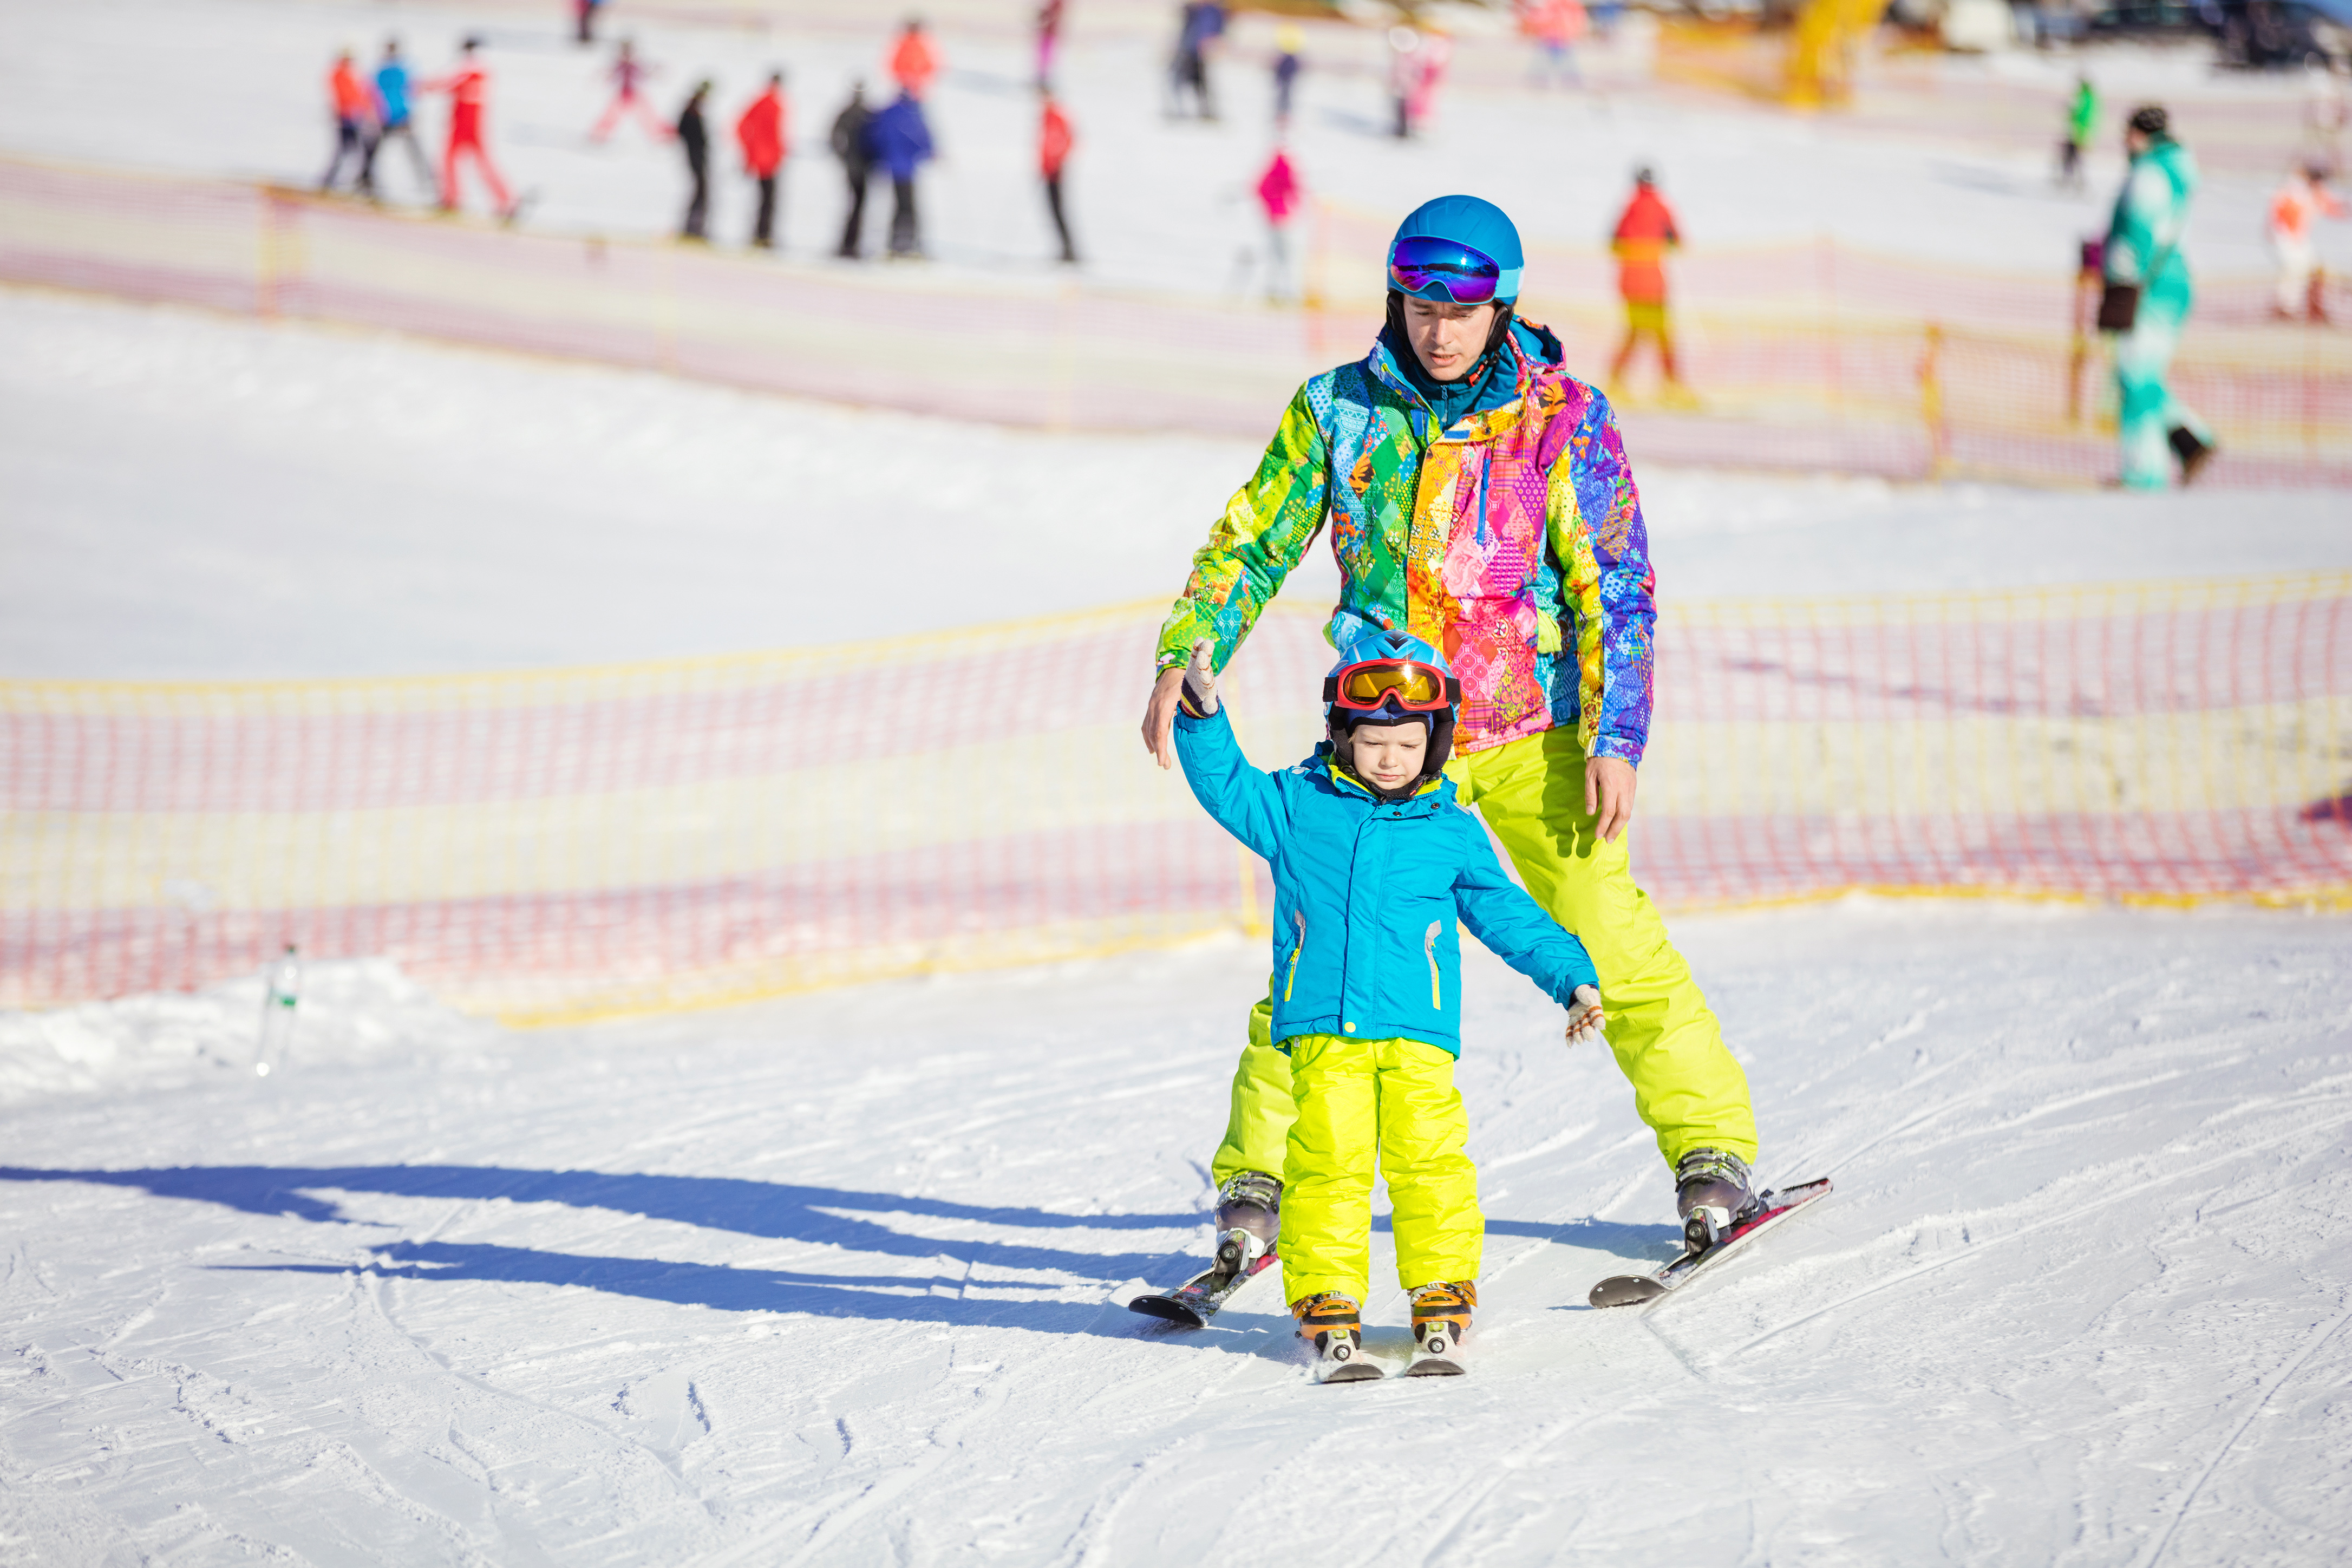 Ski Protect - Seguro de Ski familiar - Seguro para esquiadores